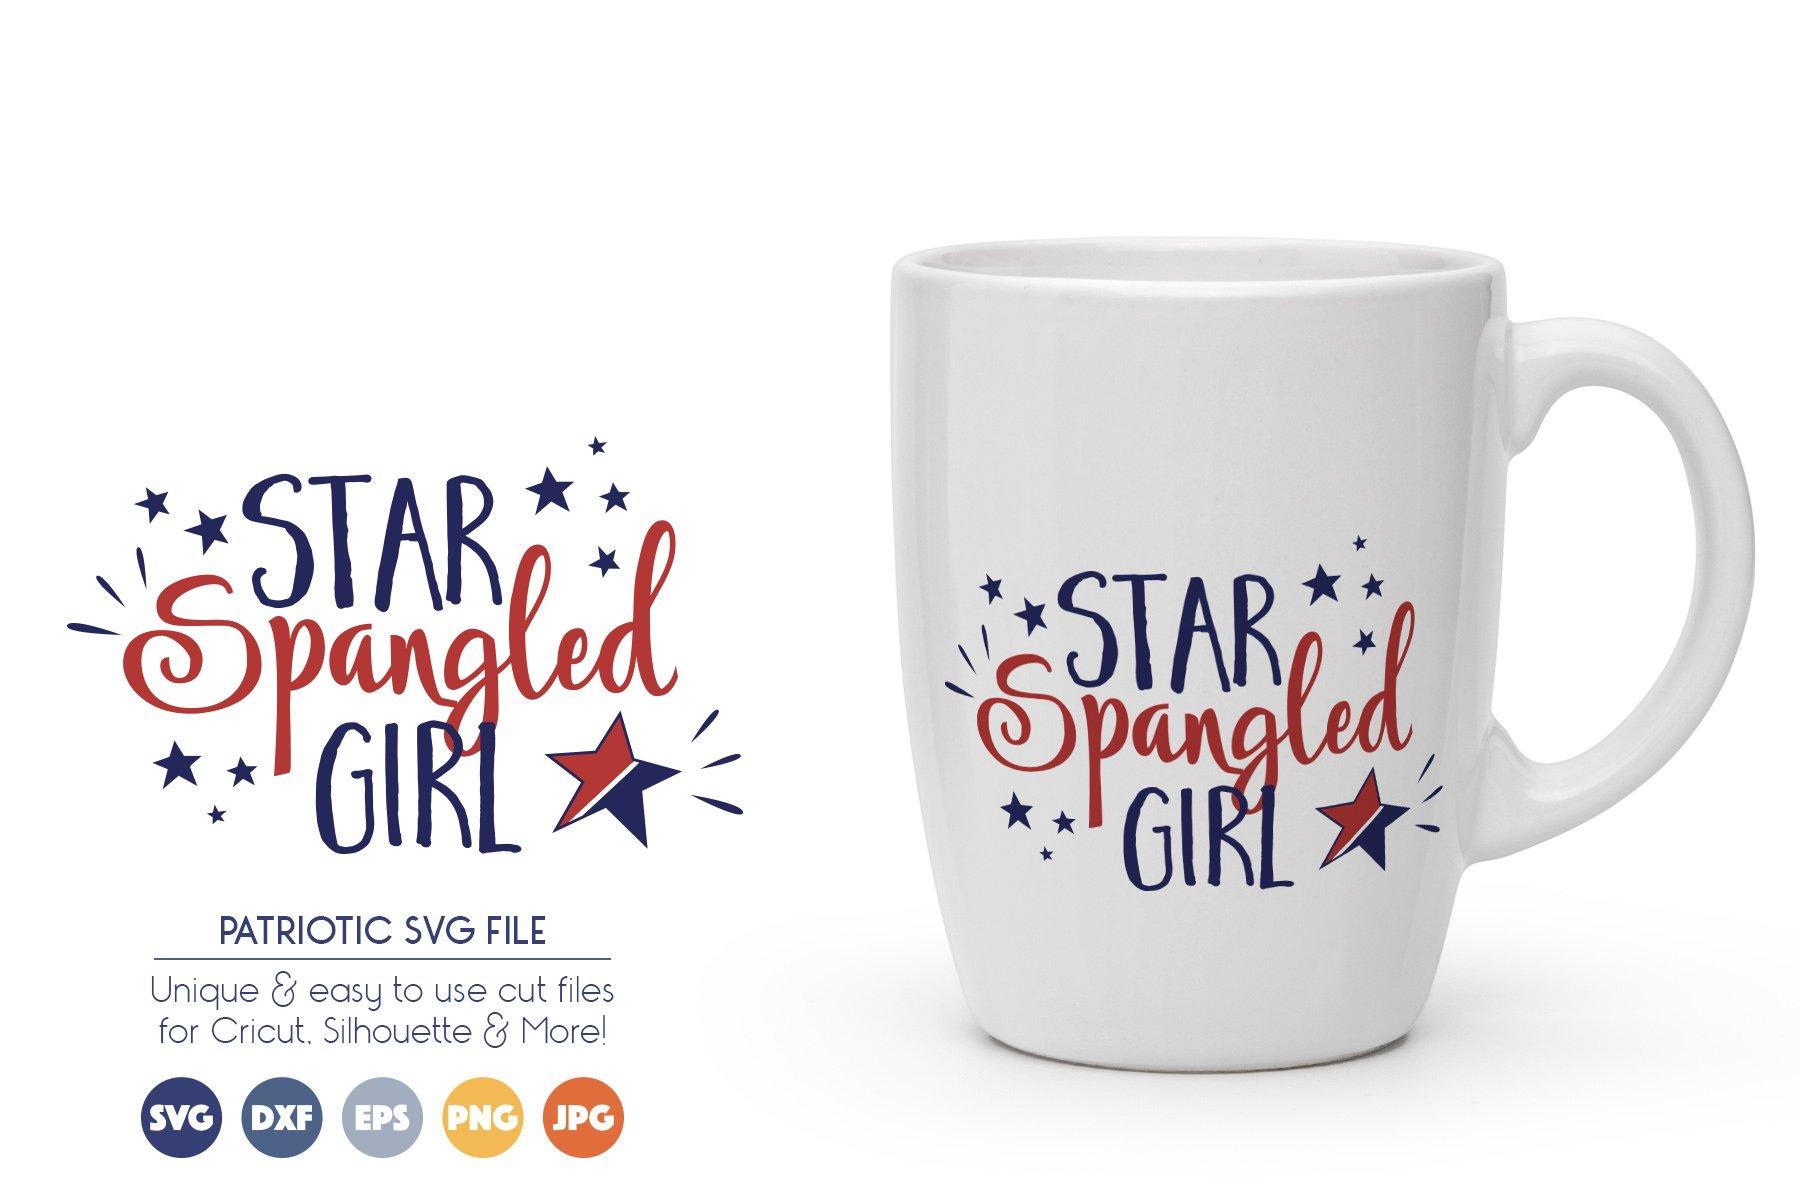 Patriotic SVG Cut Files - Star Spangled Girl example image 1